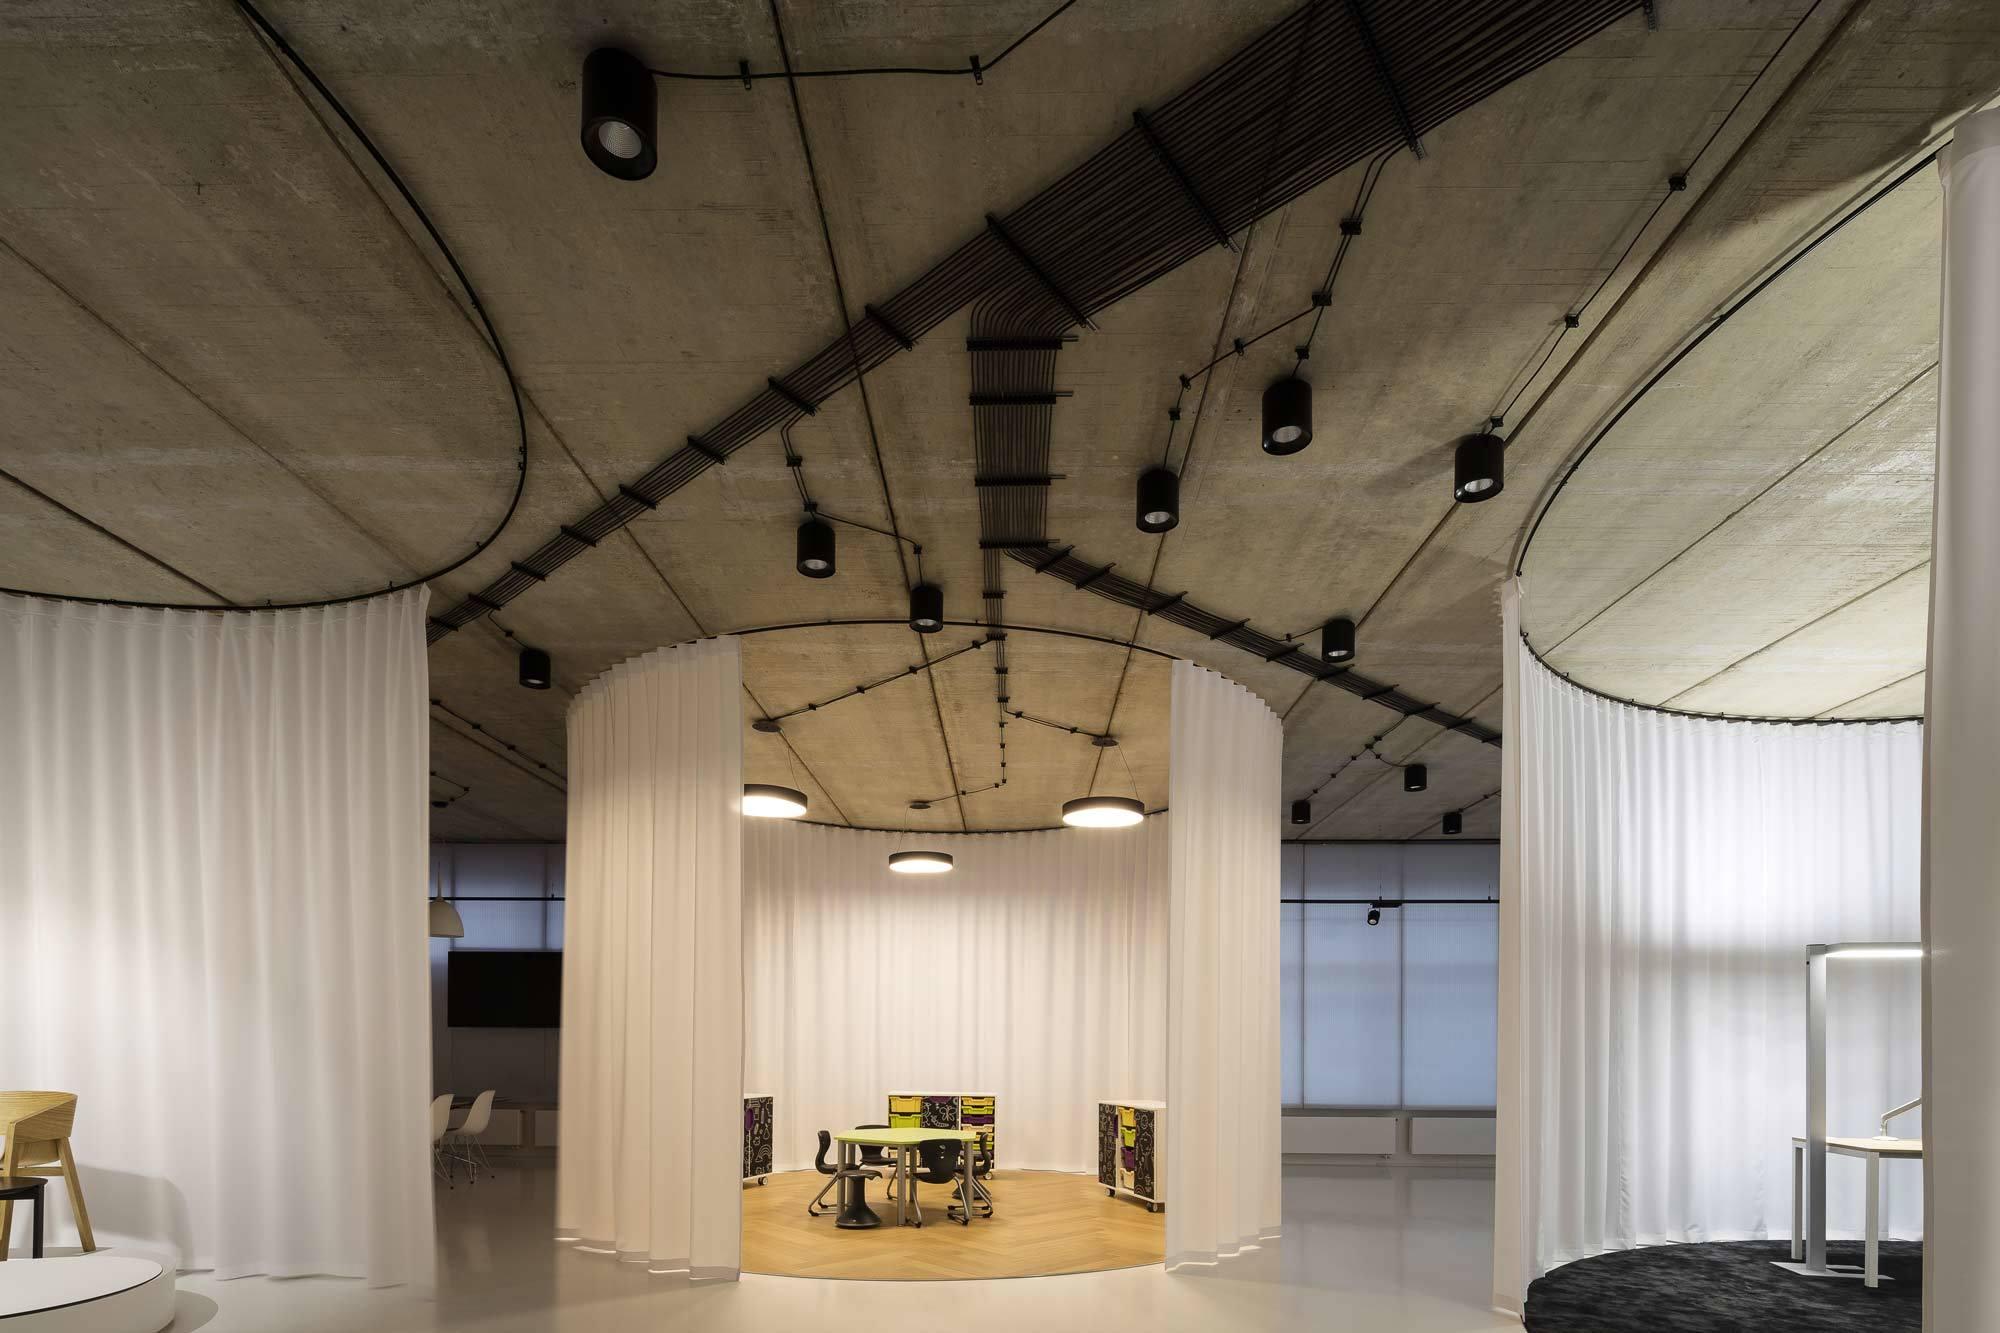 Gallery of Furniture, CHYBIK + KRISTOF, Brno, 2017, Foto: Lukas Pelech